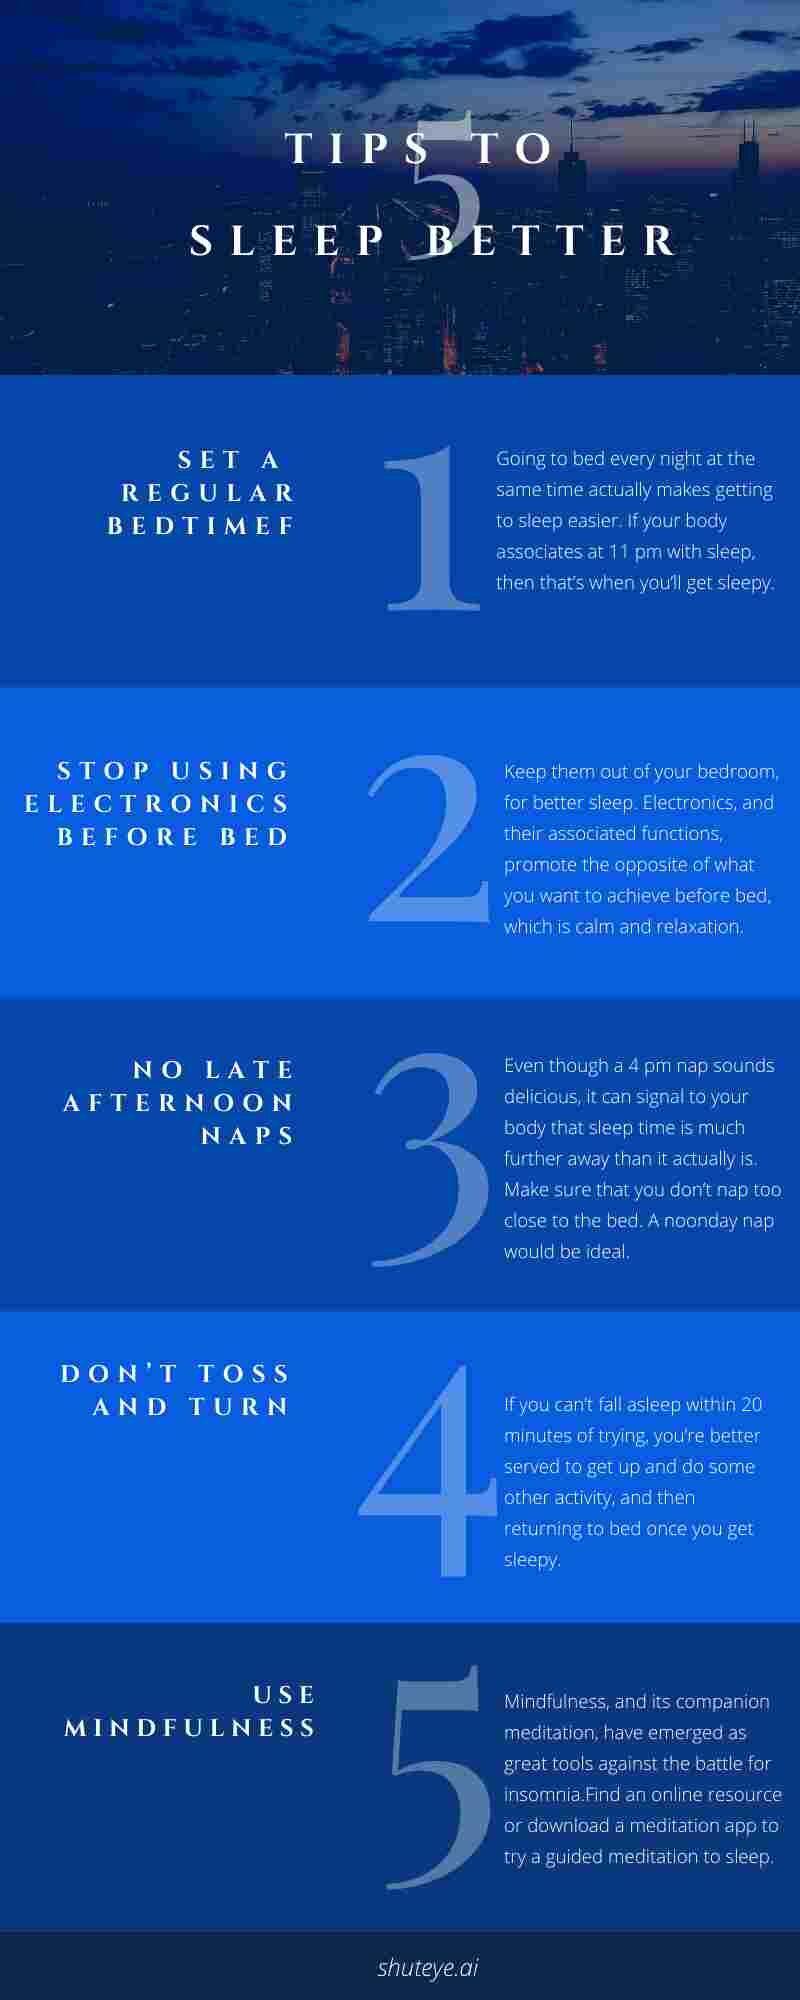 ShutEye sleep better tips sleep hygiene improve sleep quality